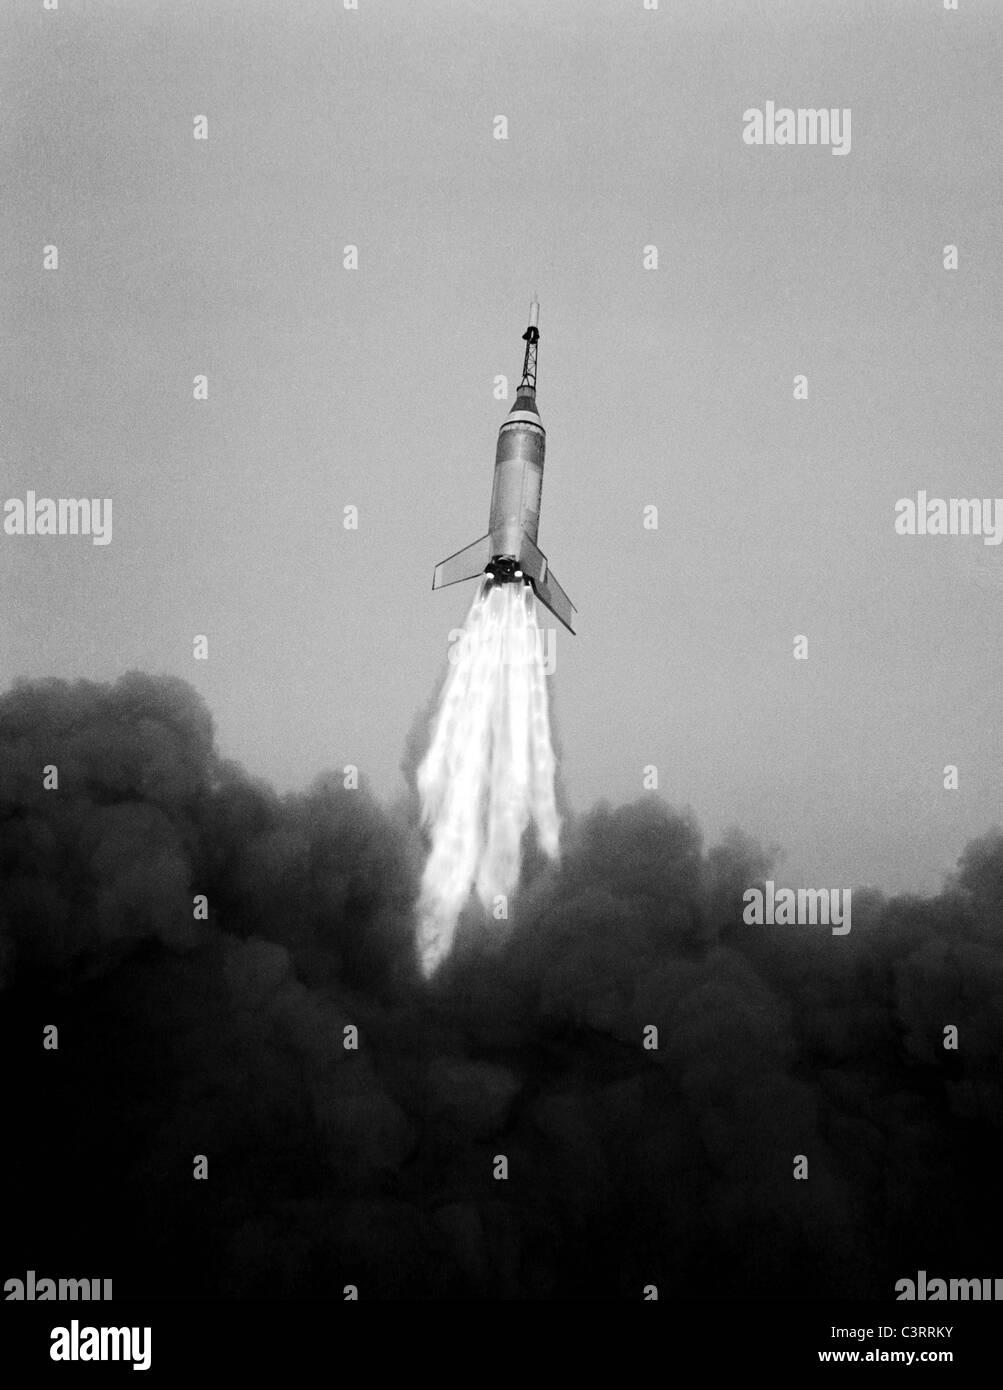 Launching of the LJ6 Little Joe on Oct. 4, 1959 - Stock Image